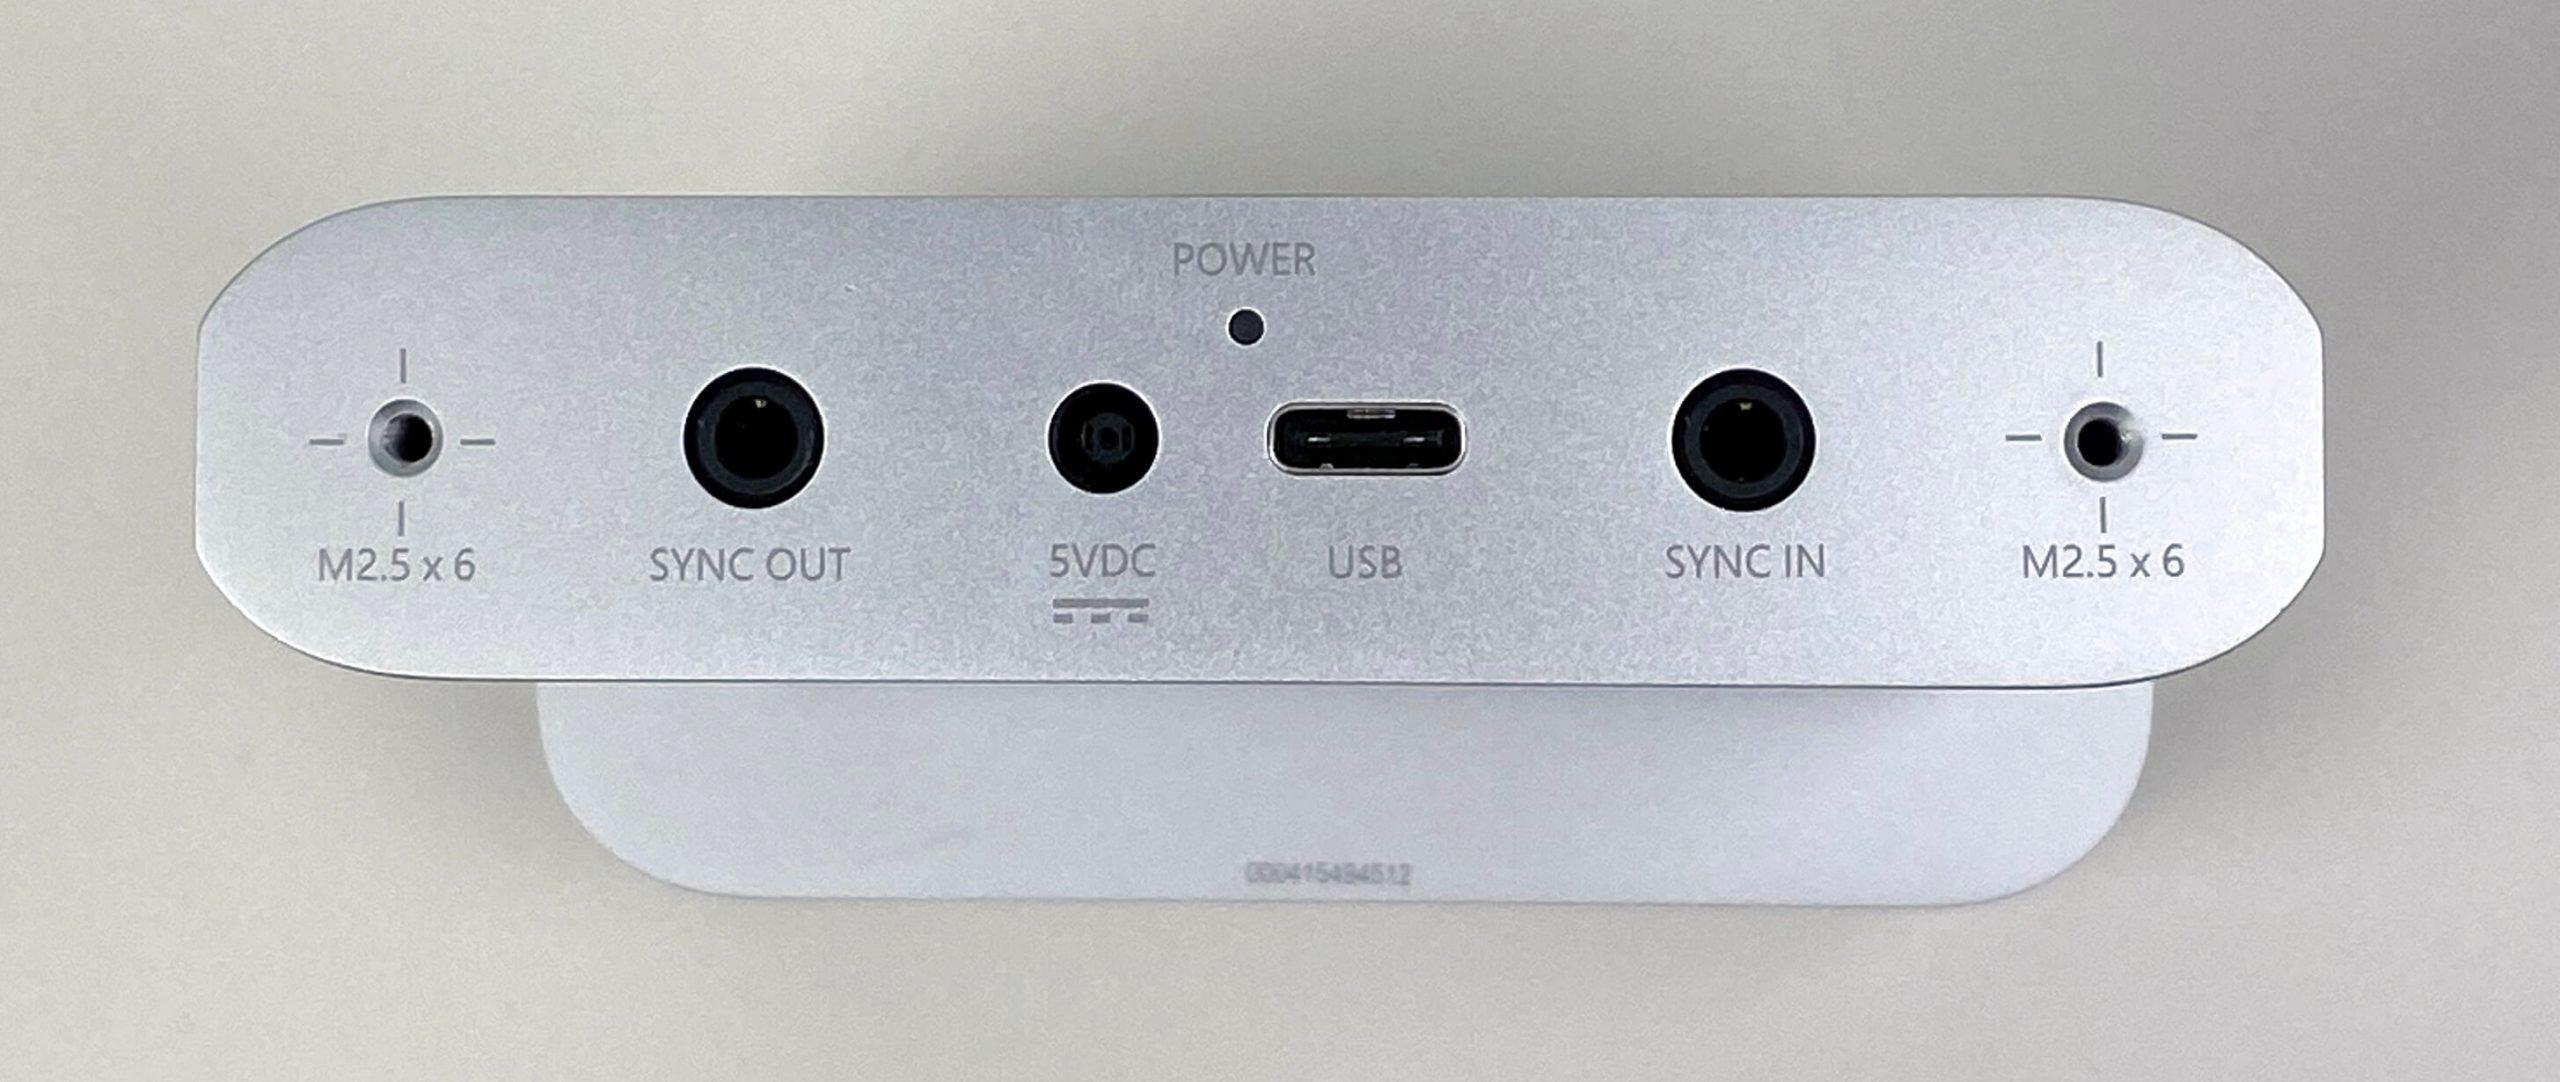 Azure Kinect Sensor - Back